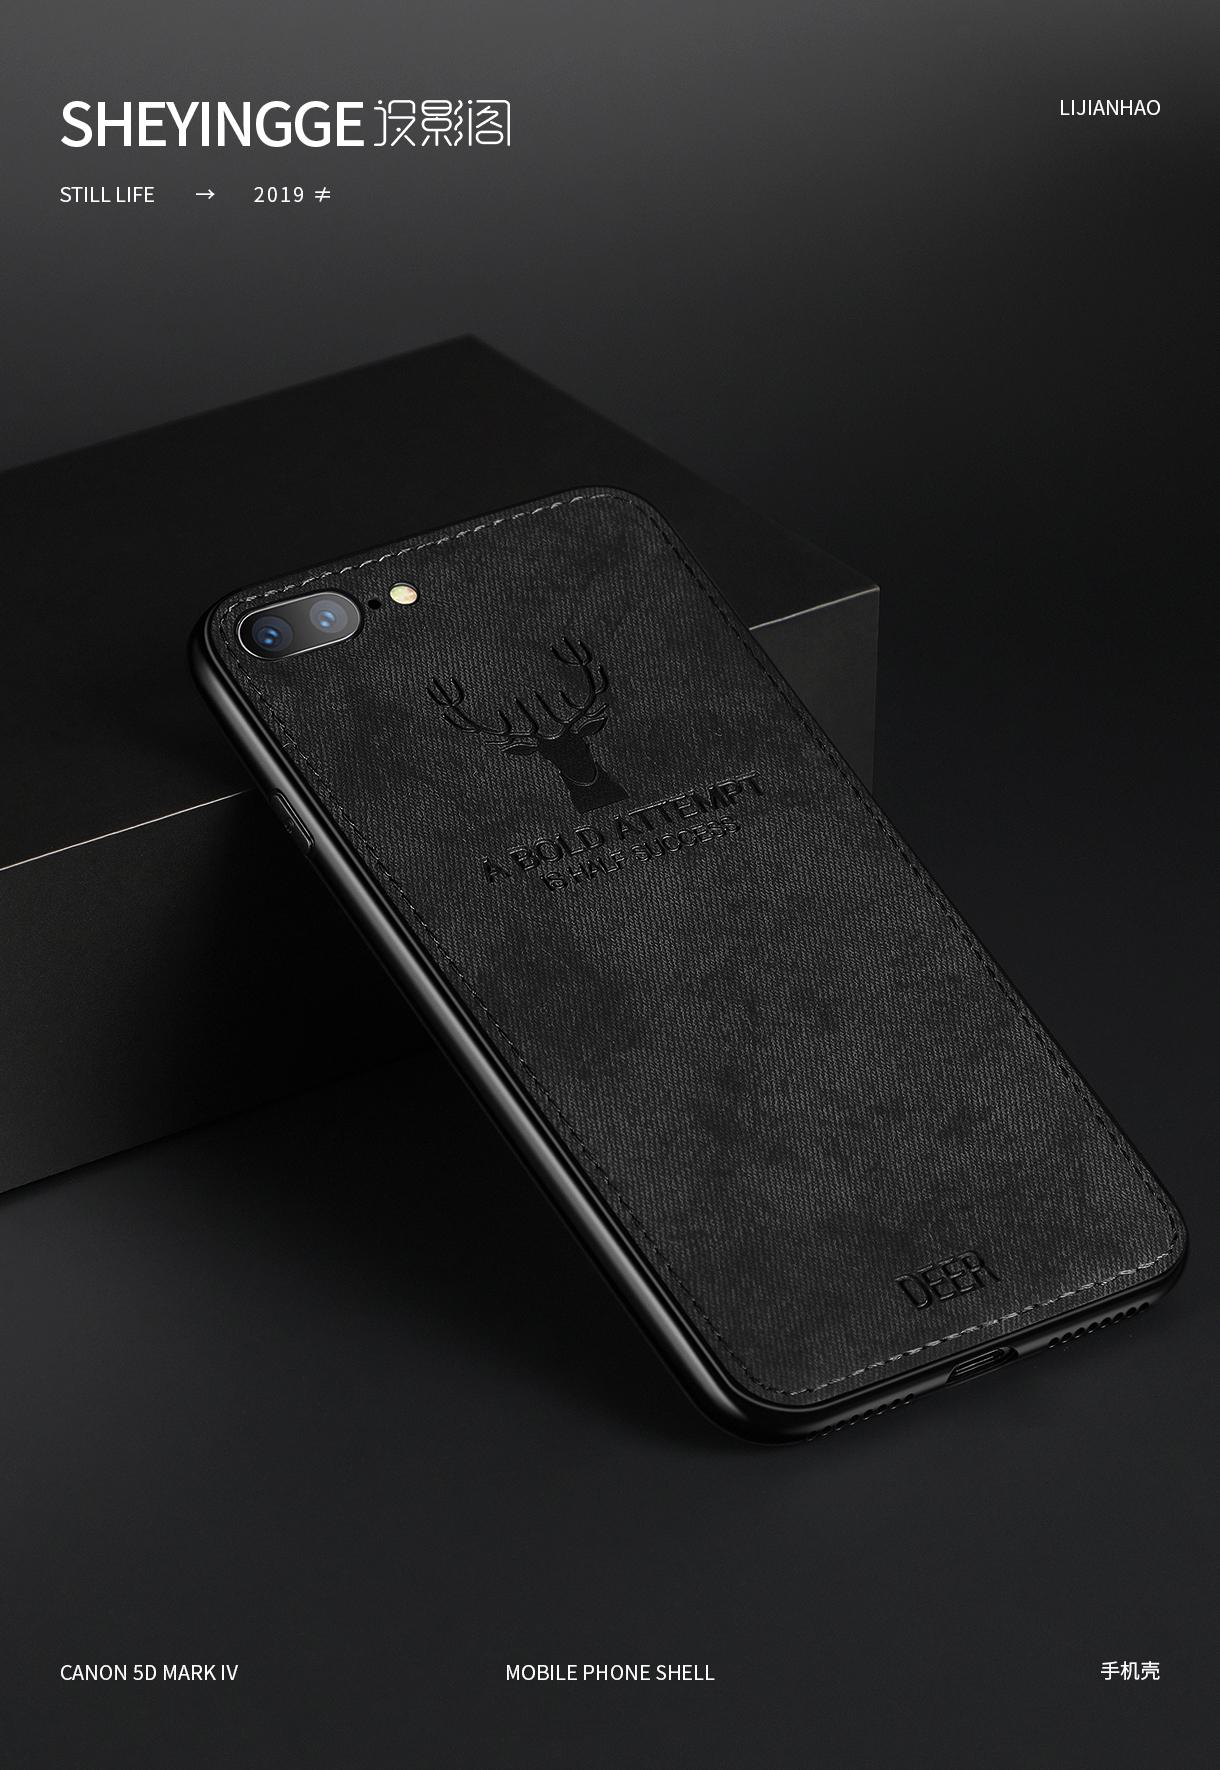 iPhone8苹果手机壳/详情页设计